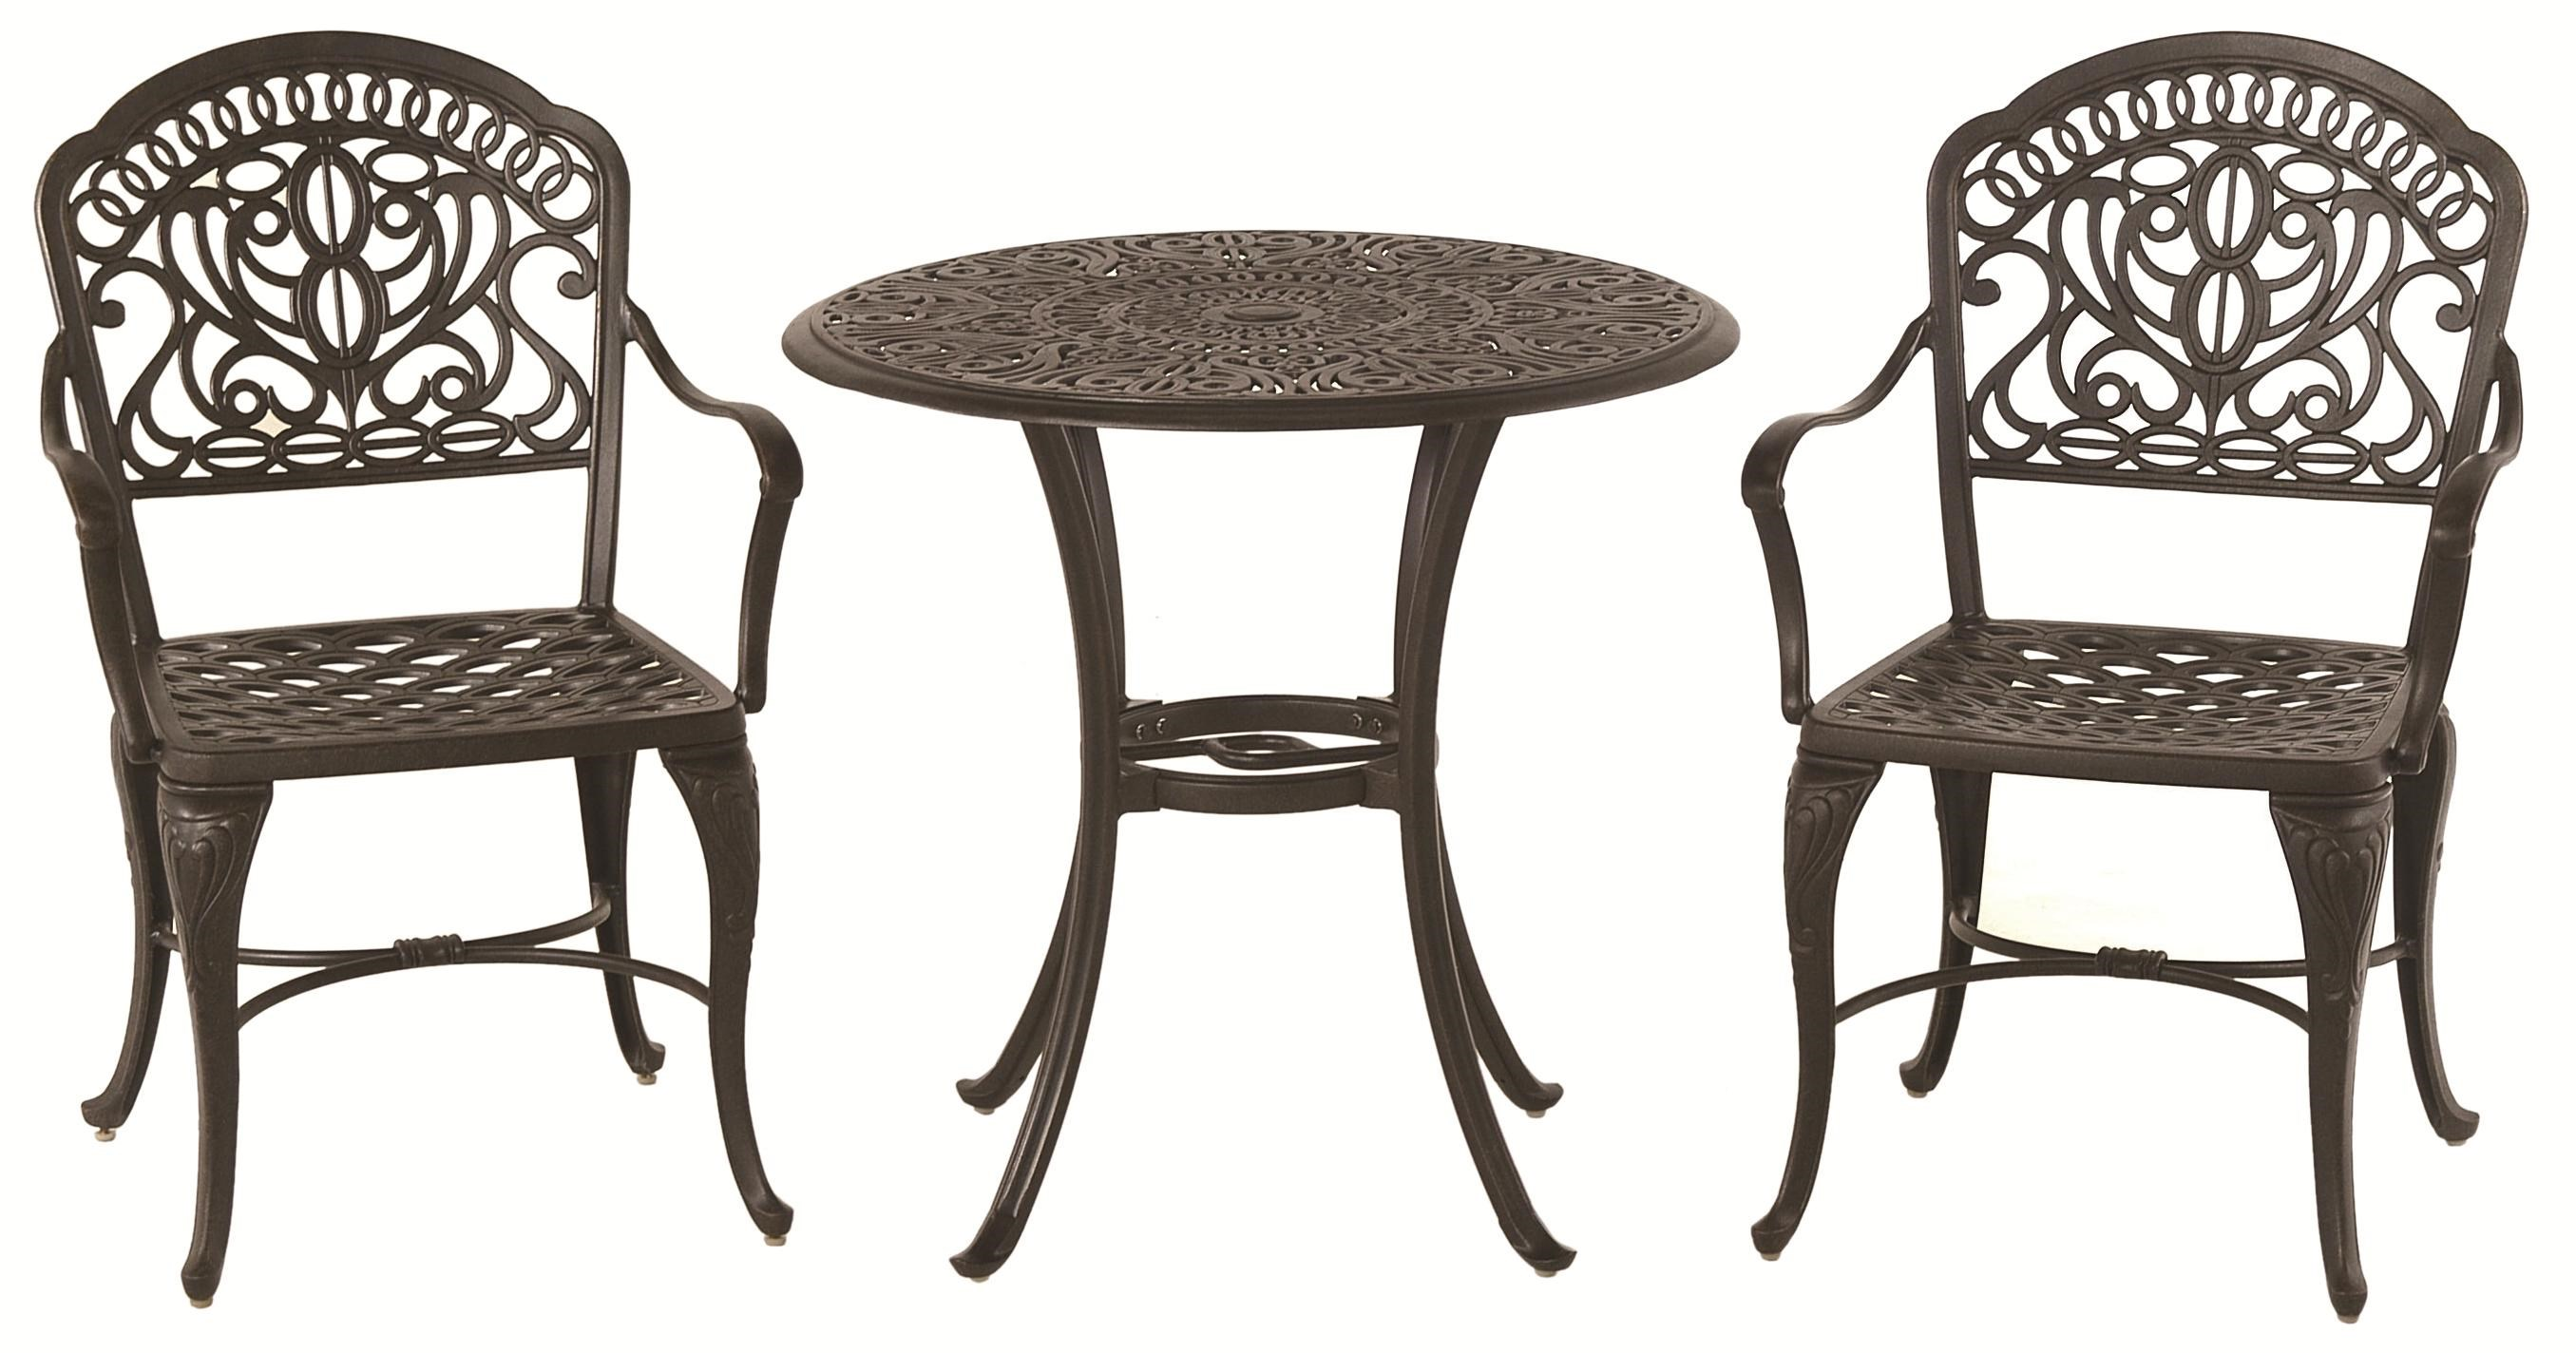 Hanamint Tuscany Patio Furniture Home Design Ideas And